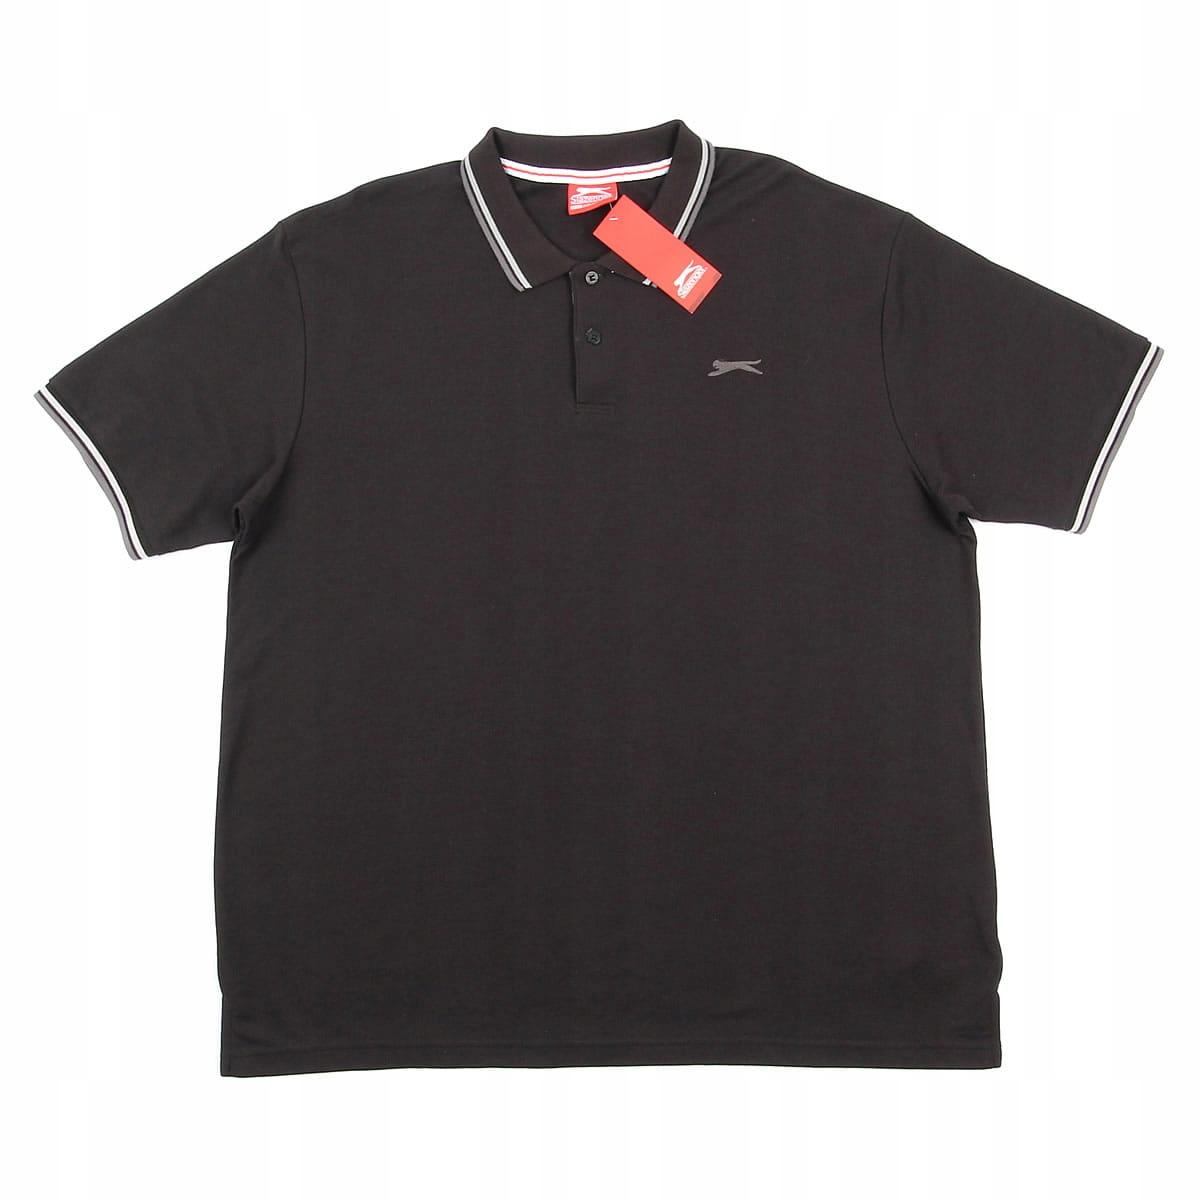 Koszulka polo męska Slazenger 3XL